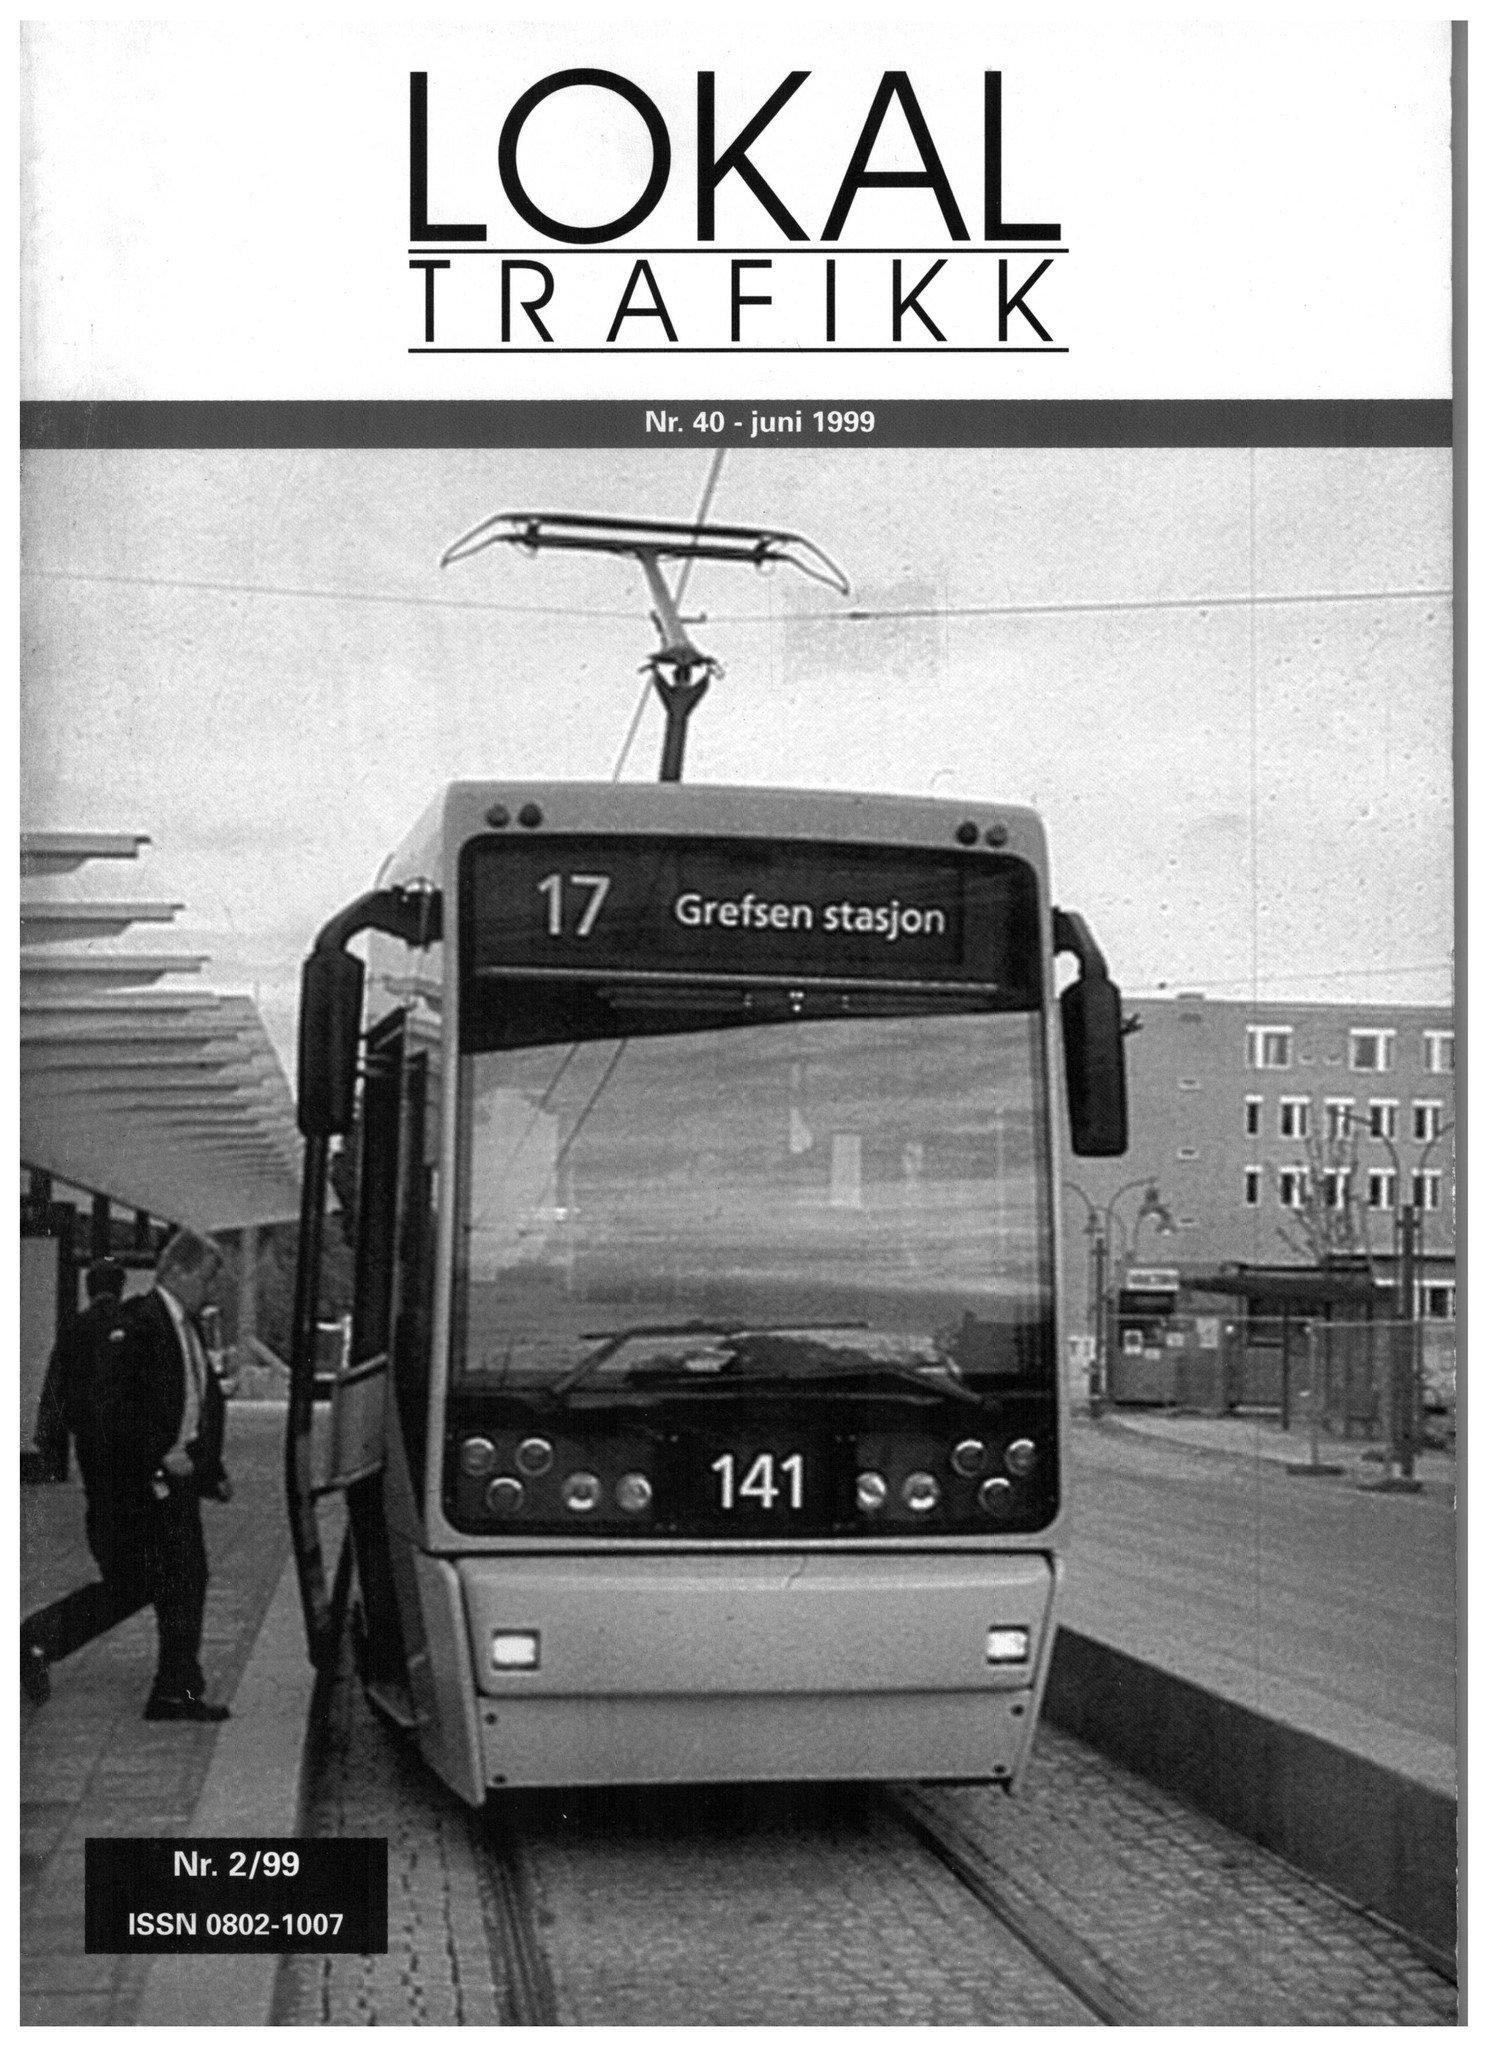 Lokaltrafikk #040